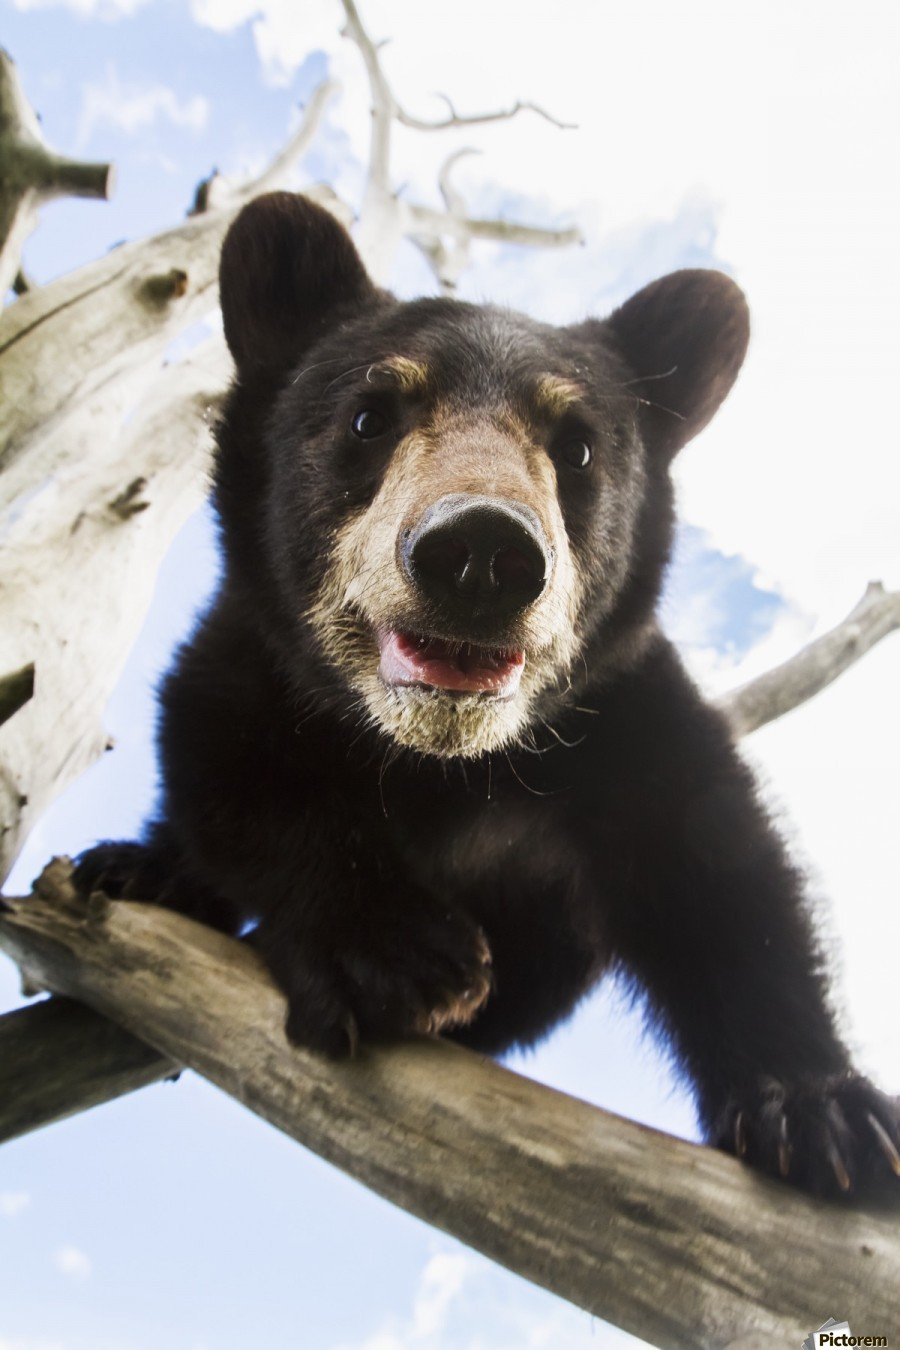 Black bear cub (ursus americanus), captive in Alaska Wildlife Conservation Center, South-central Alaska; Portage, Alaska, United States of America  Print